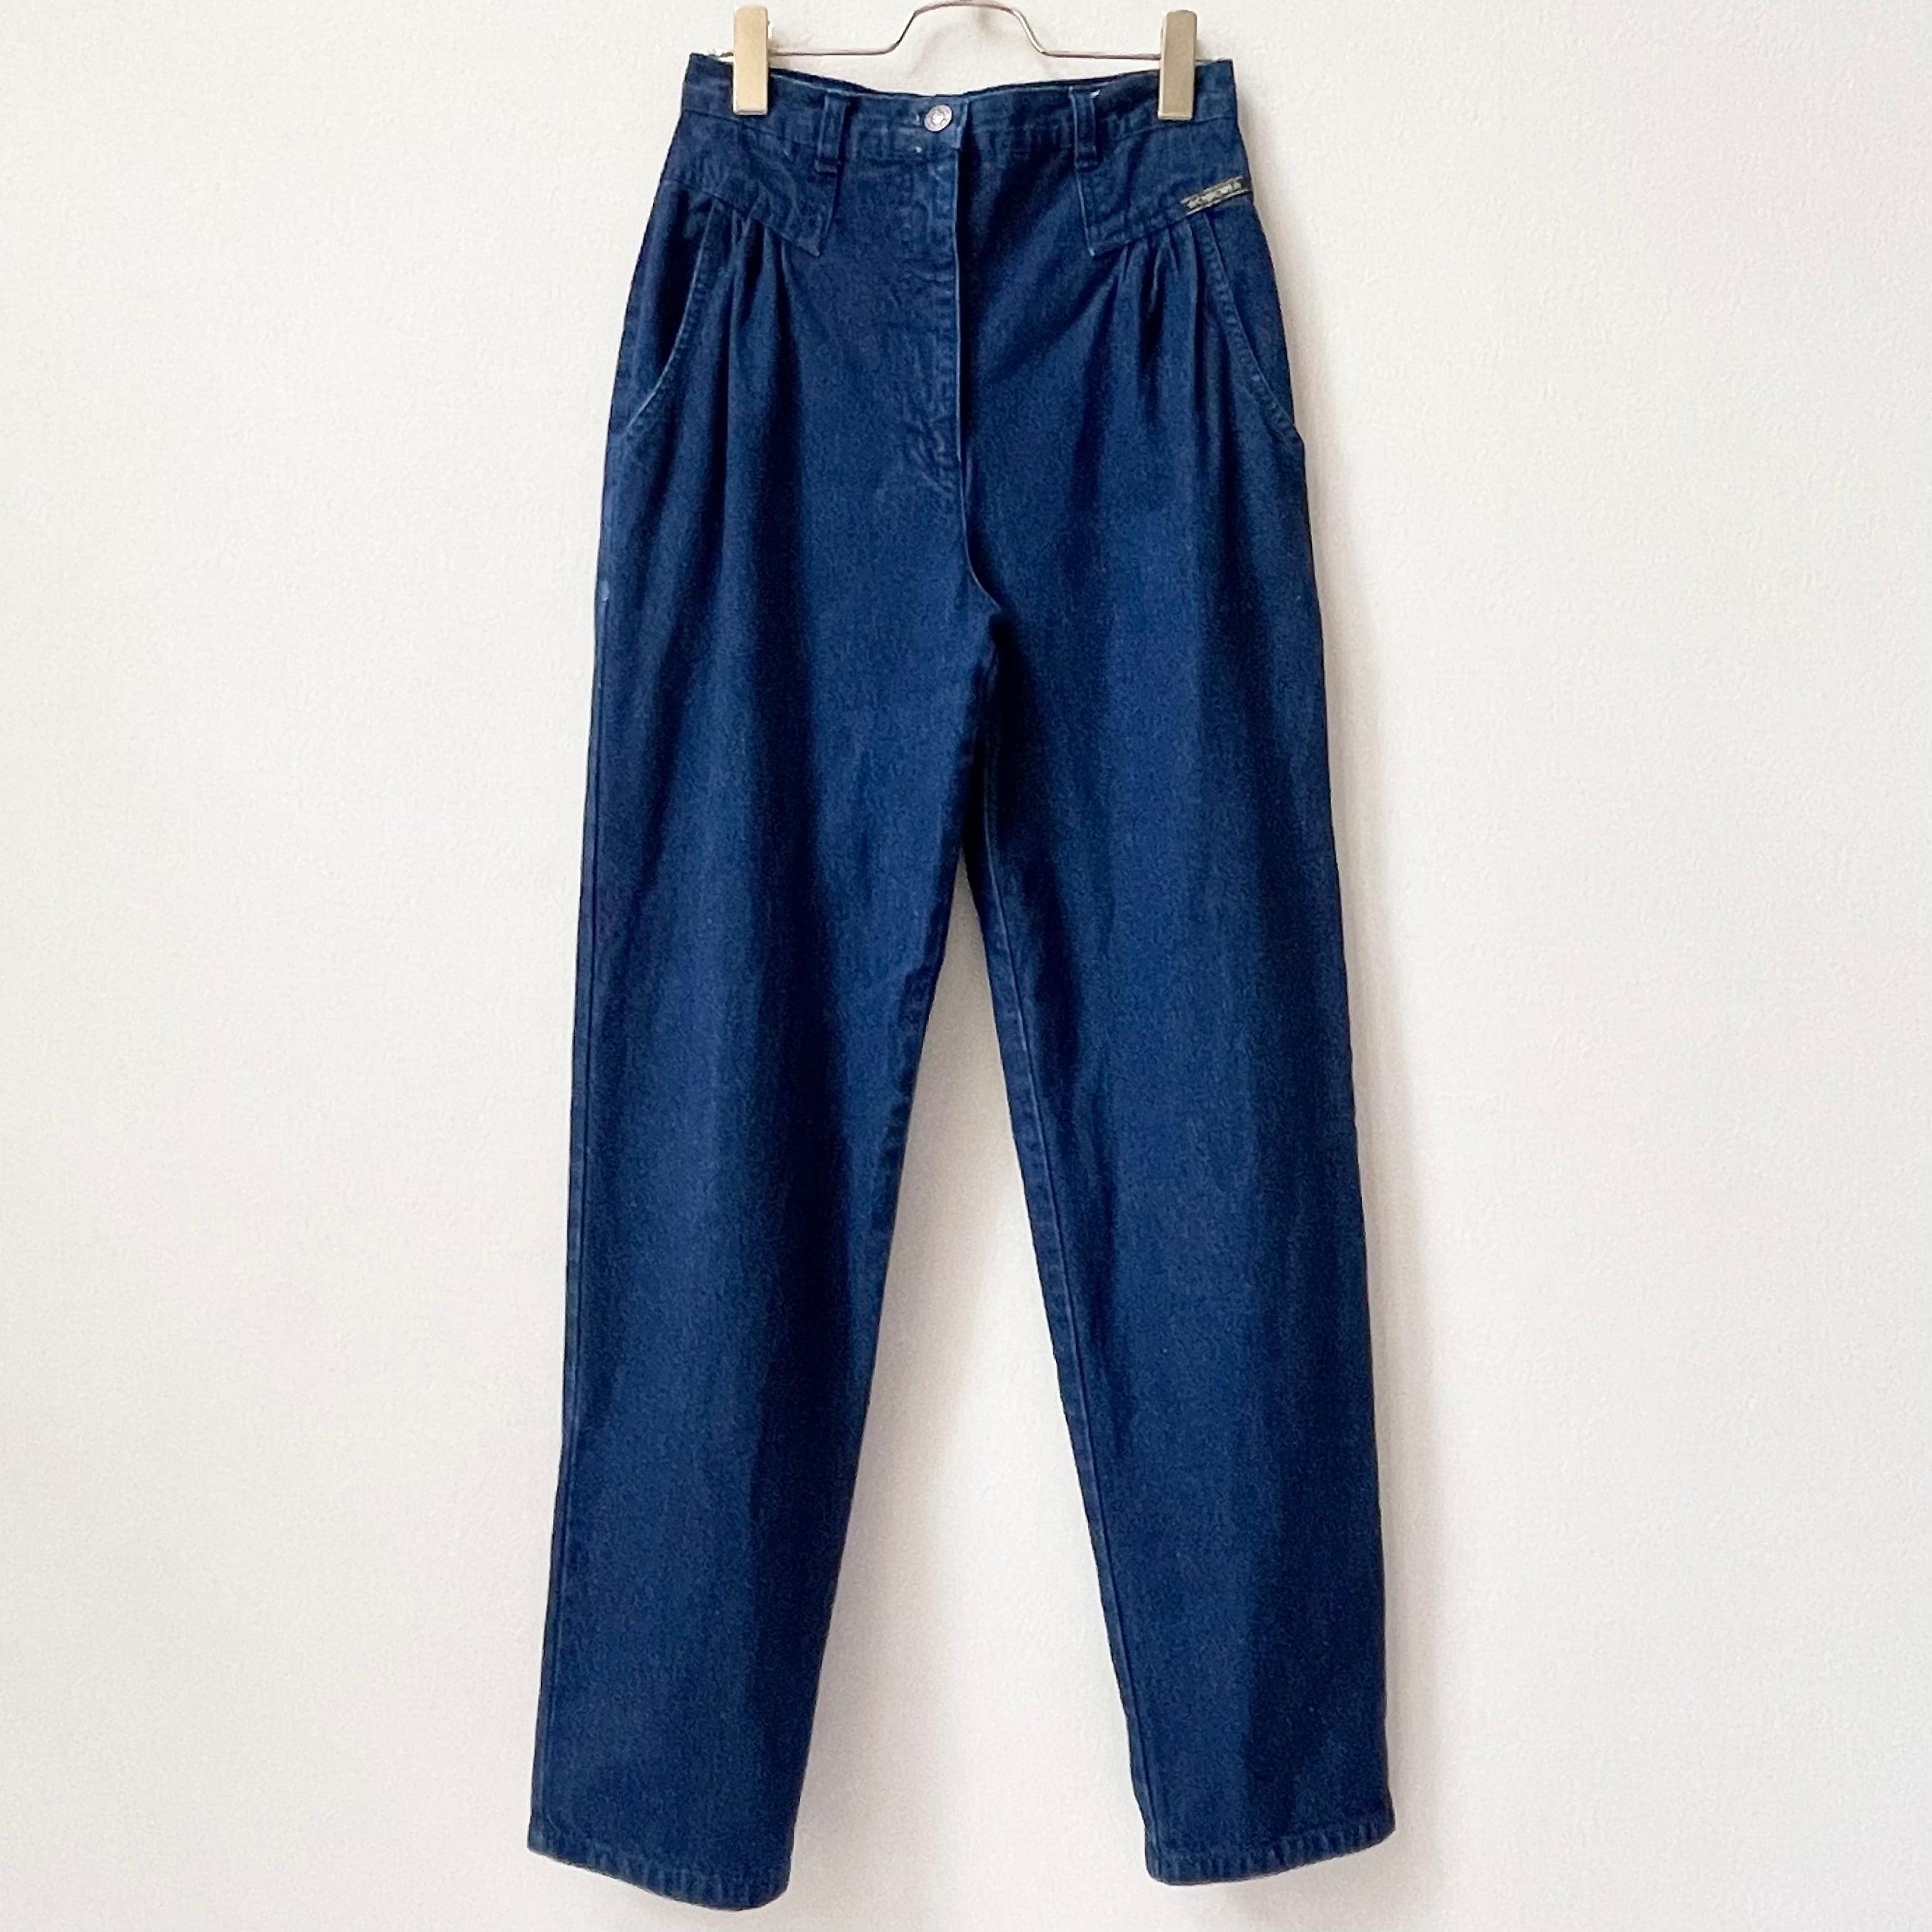 CHEROKEE チェロキー デニムパンツ 80年代 アメリカ古着 日本M